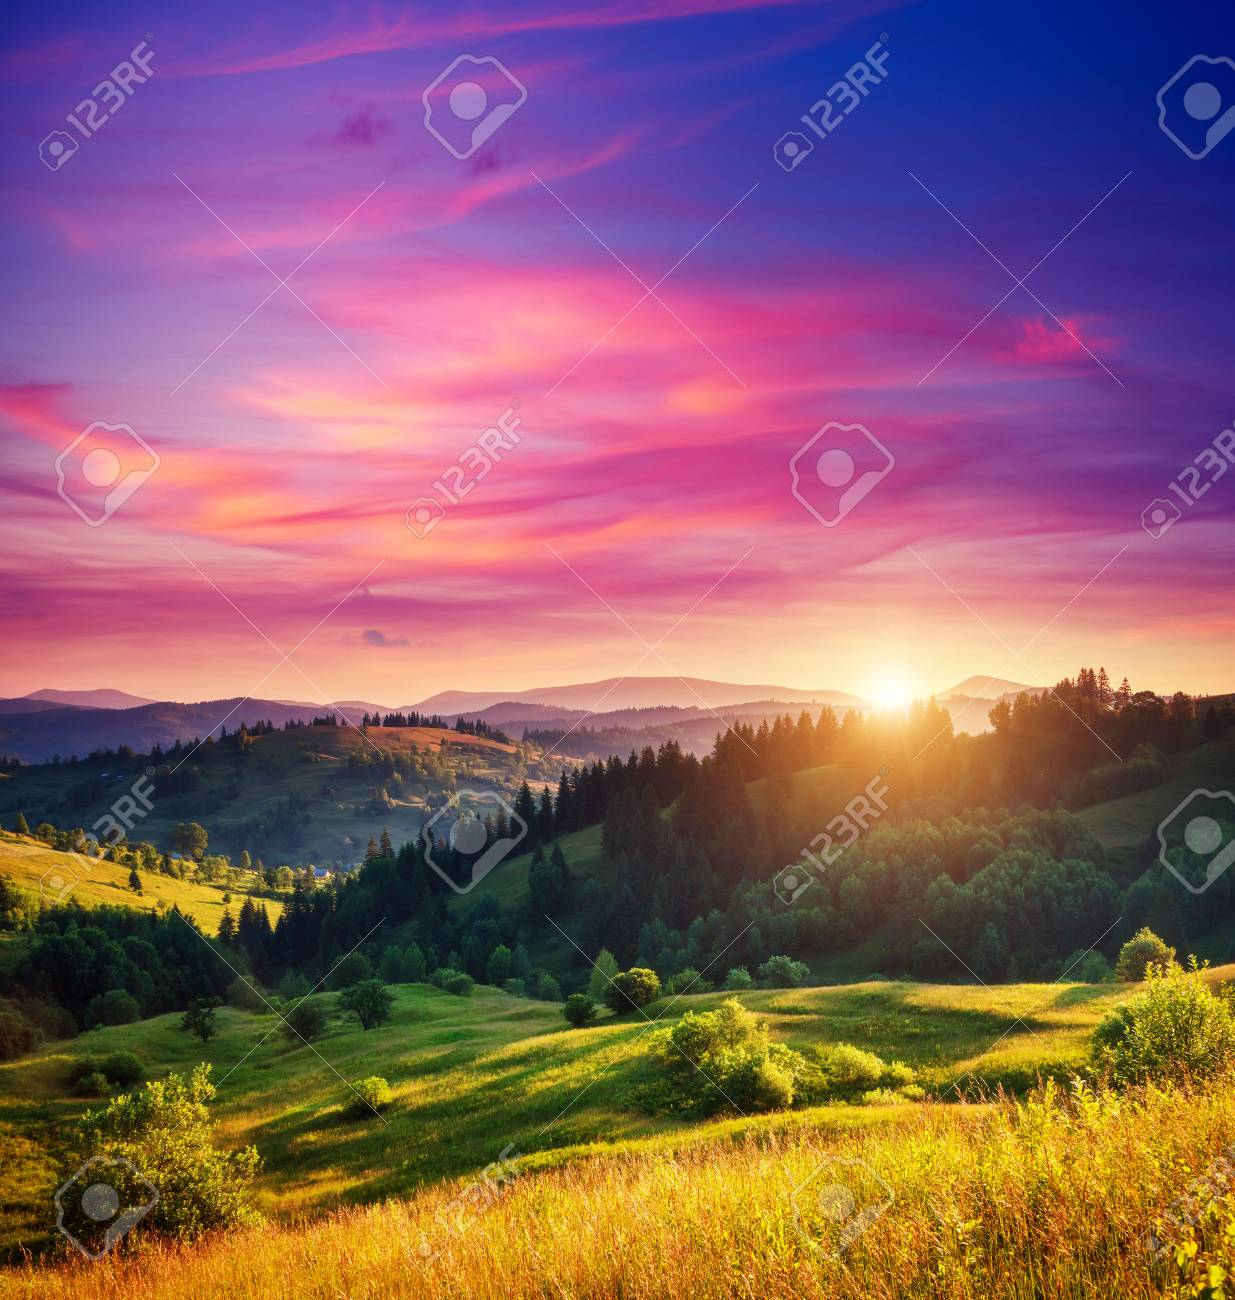 Beautiful green hills glowing by warm sunlight at twilight. Dramatic scene. Colorful sky, red clouds. Carpathian, Ukraine, Europe. Beauty world. - 47565709